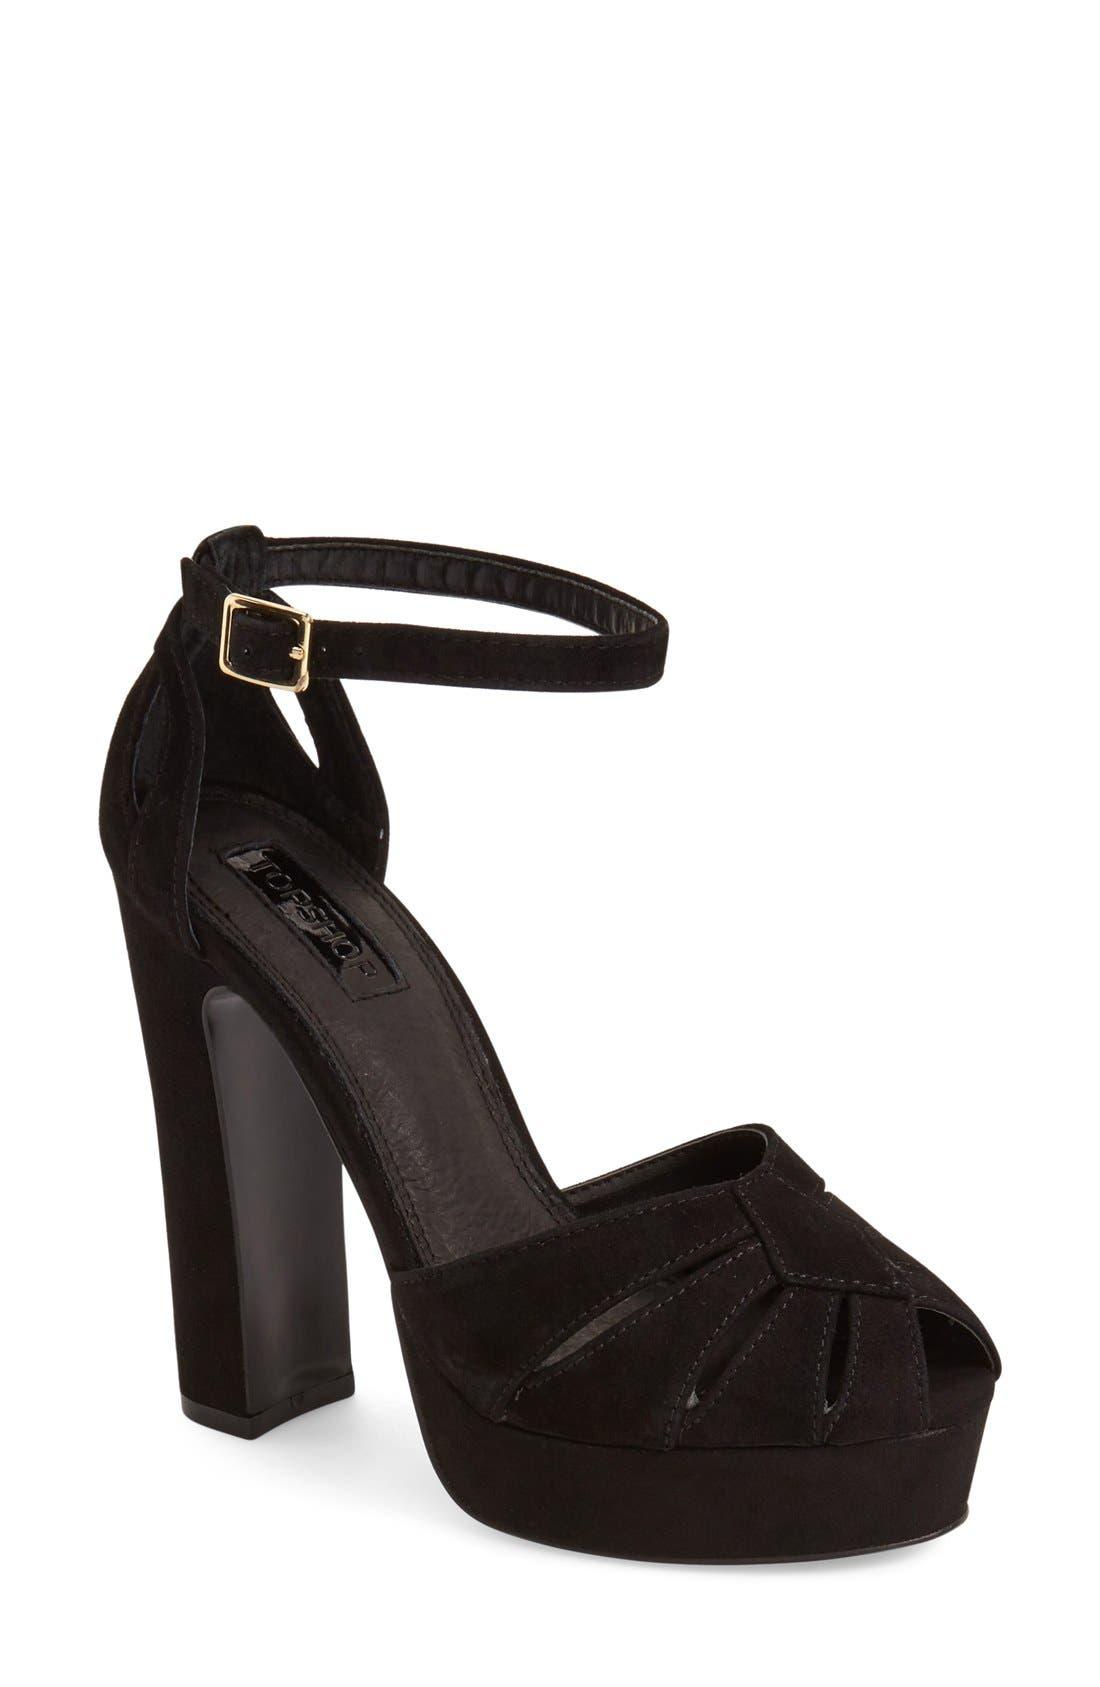 Alternate Image 1 Selected - Topshop 'Sienna' Platform Peep Toe Sandal (Women)